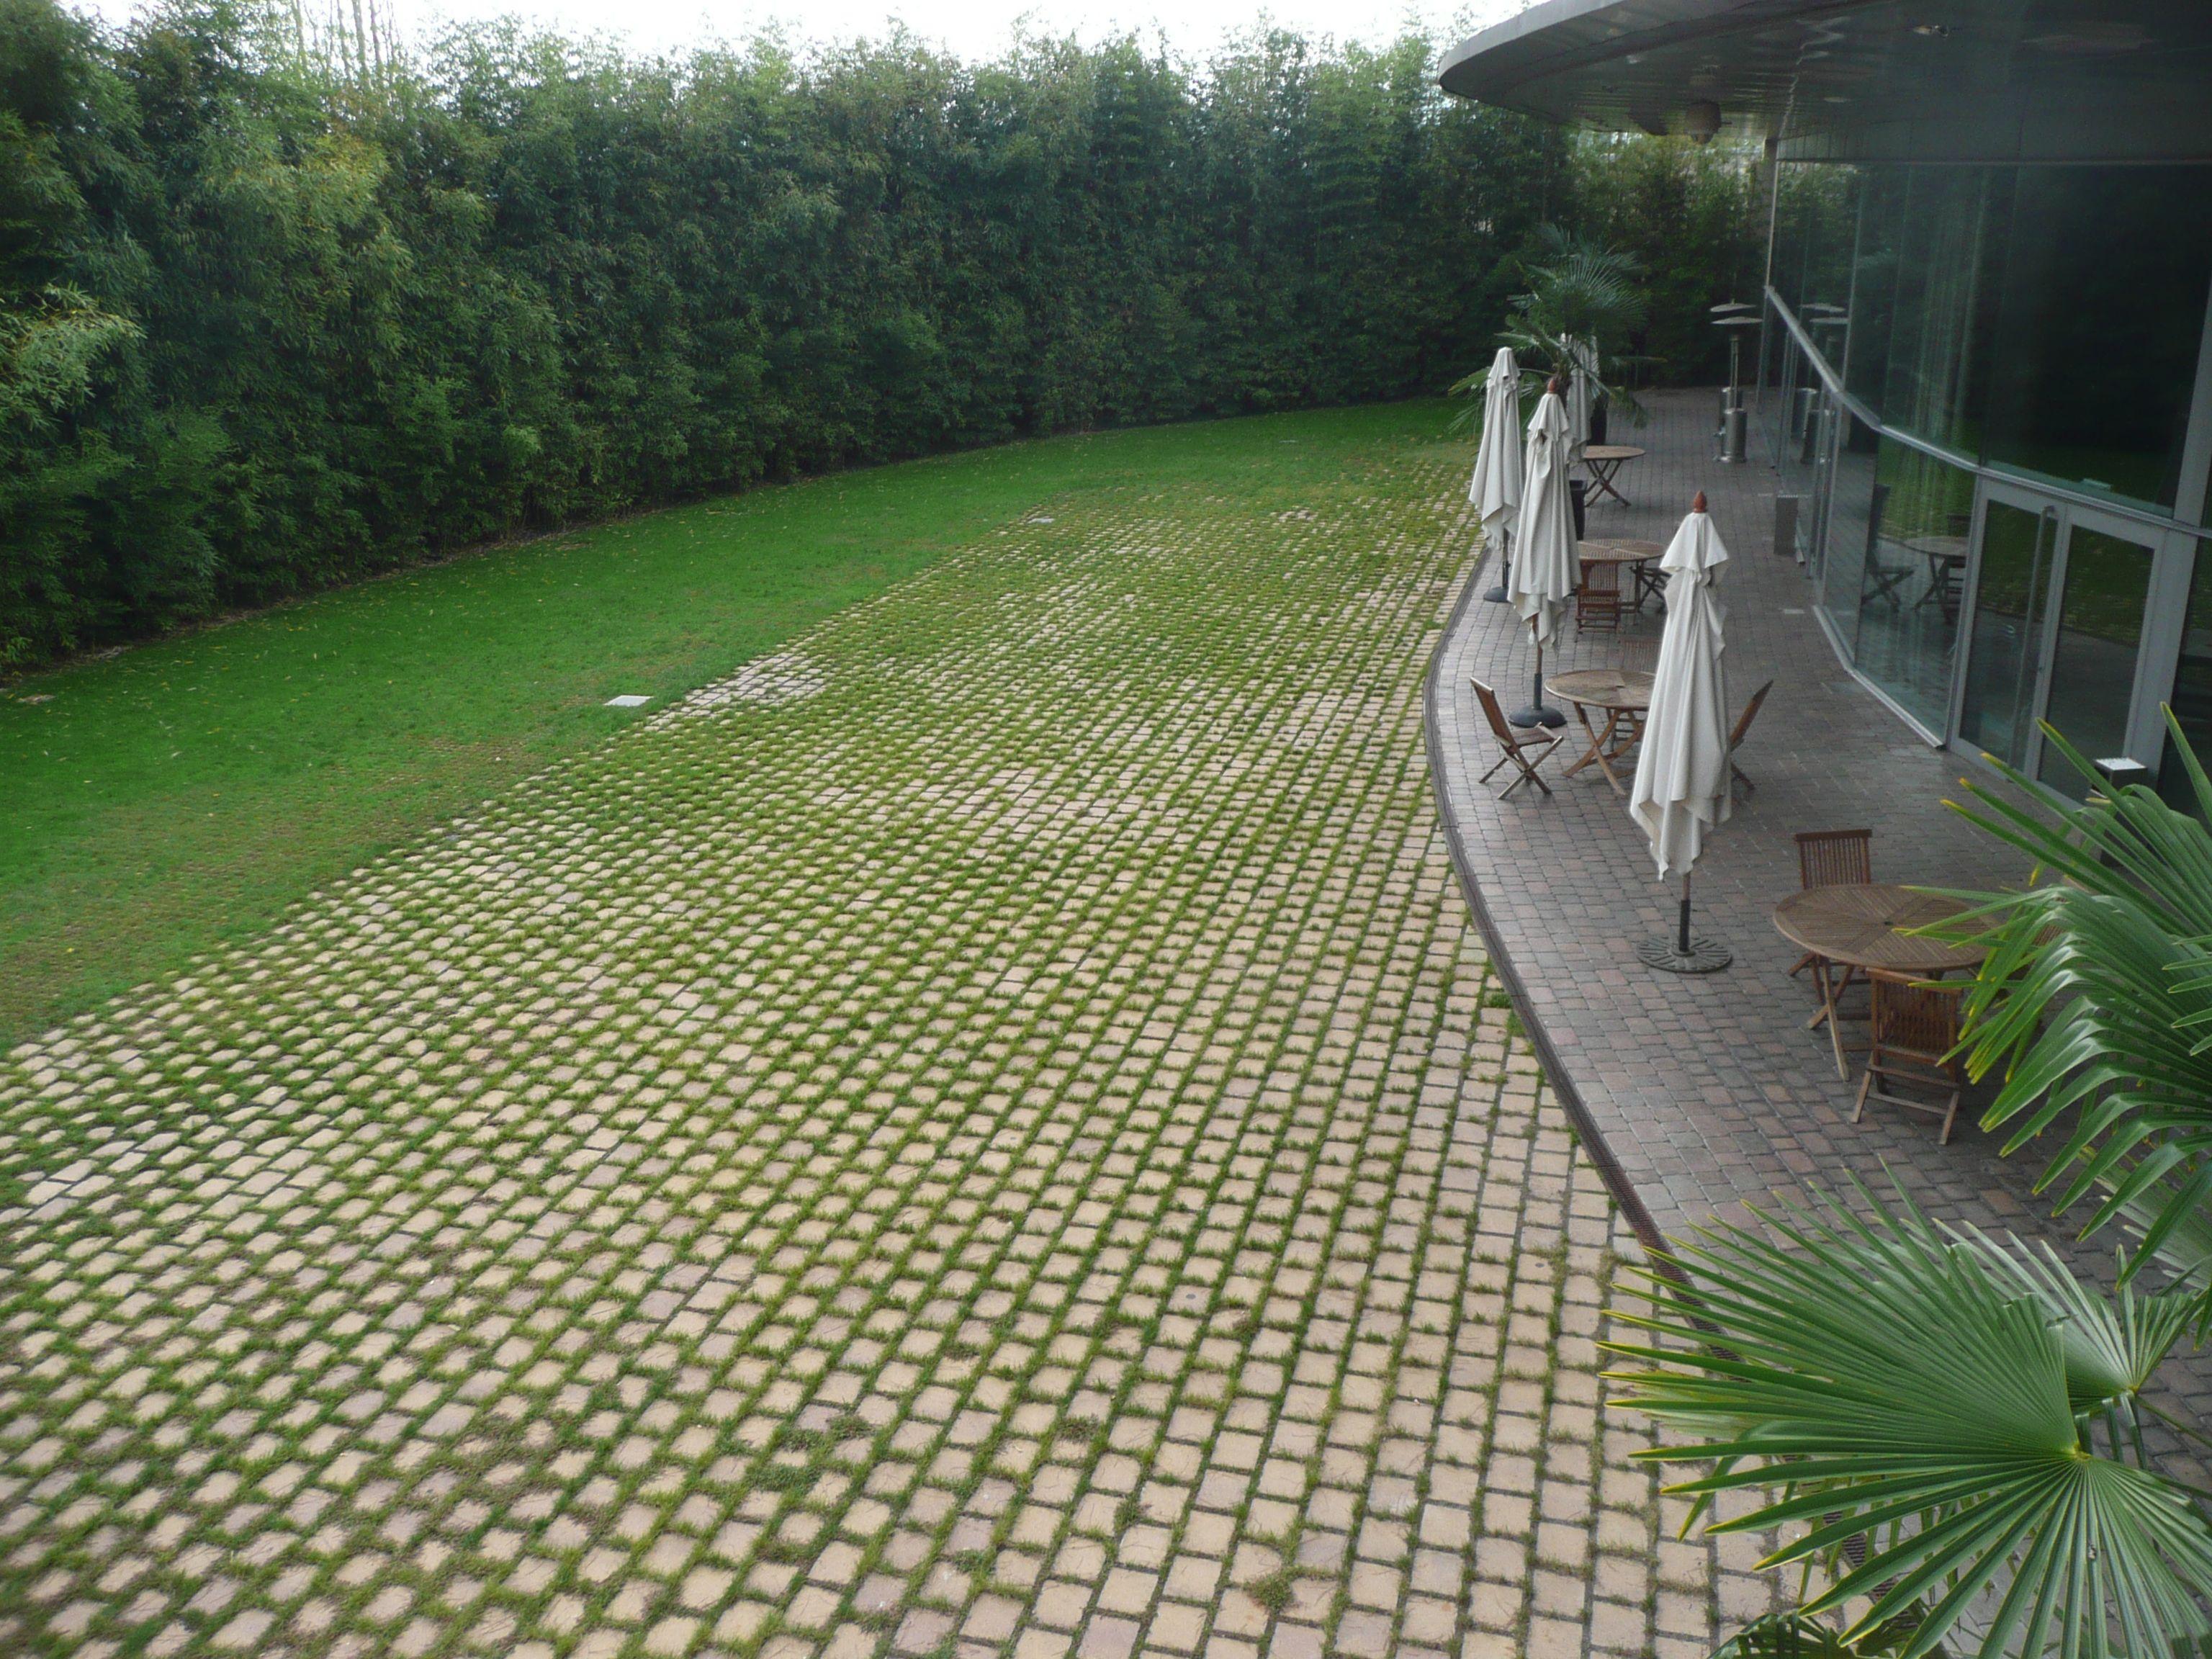 Terana green en hotel sant cugat adoqu n drenante permeable paver cesped cemento breinco - Jardines con adoquin ...